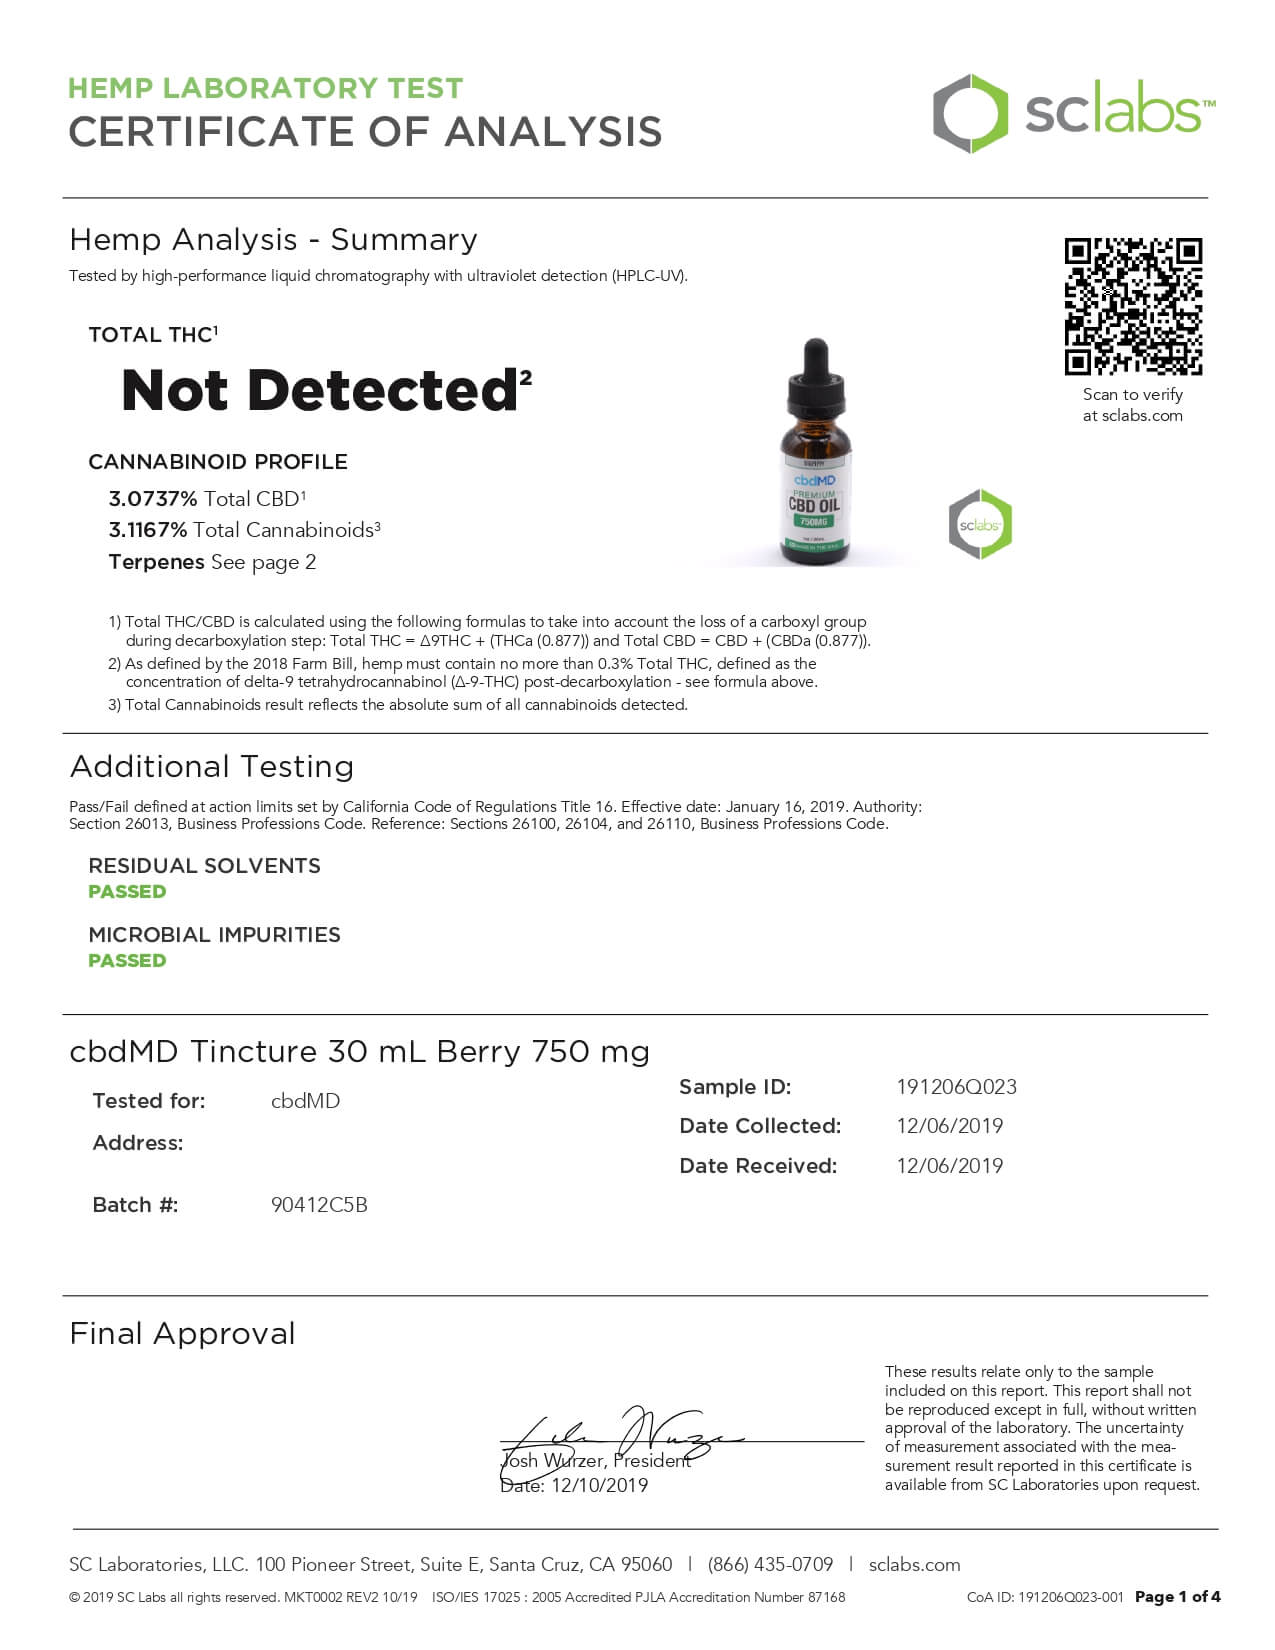 cbdMD CBD Tincture Broad Spectrum Berry 30ml 750mg Lab Report